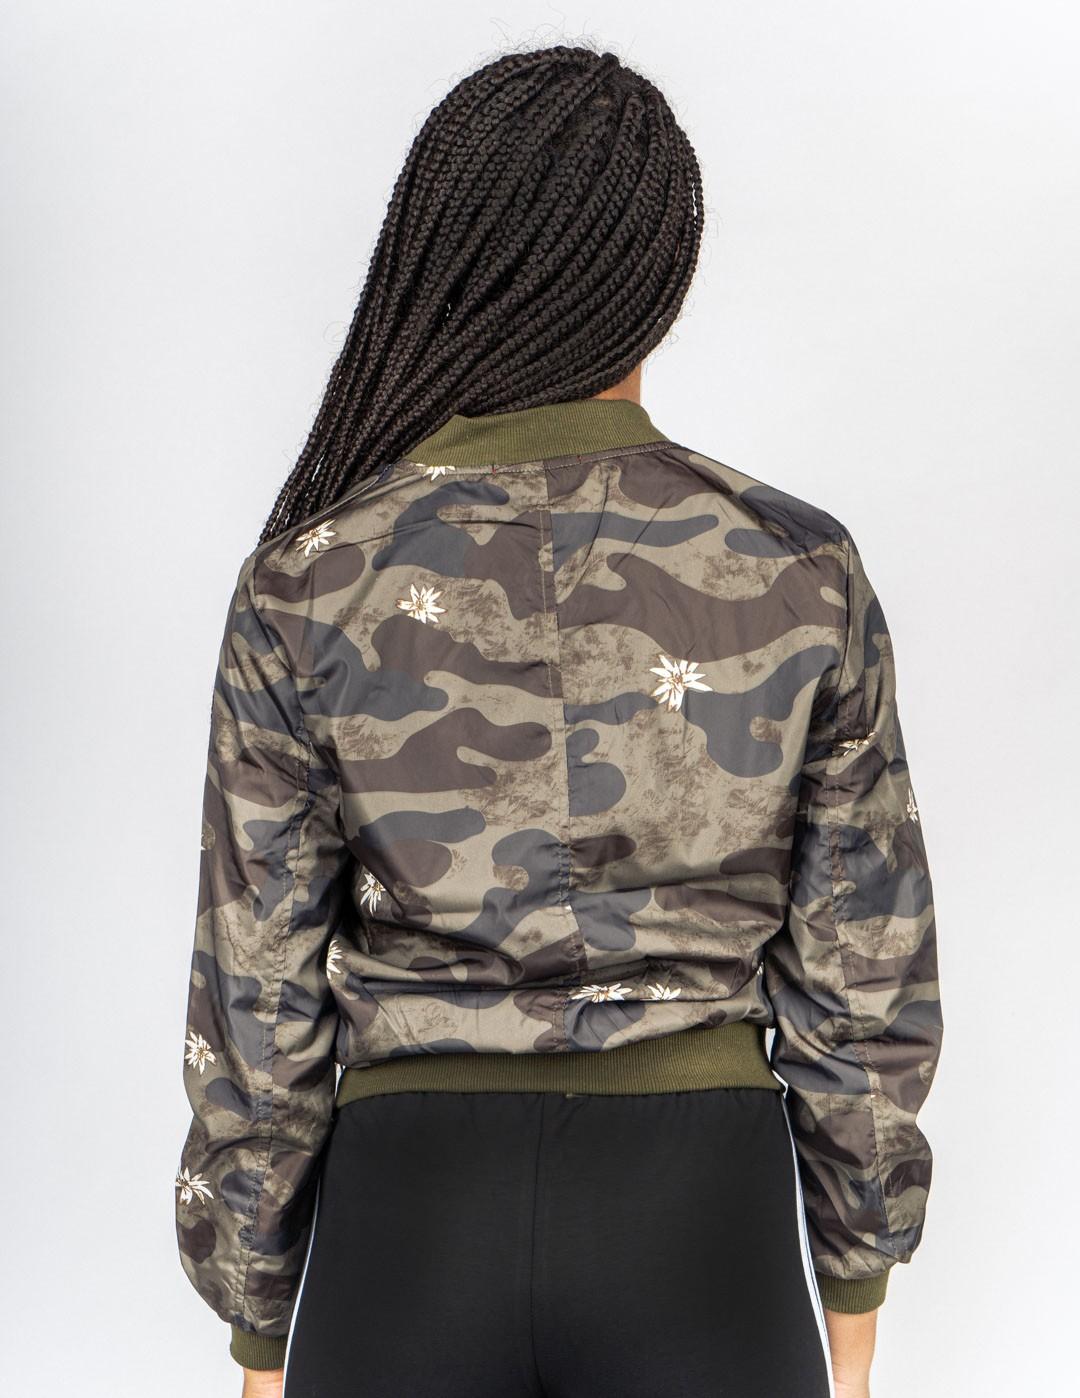 Bloom Camodresscode Fly Jacket